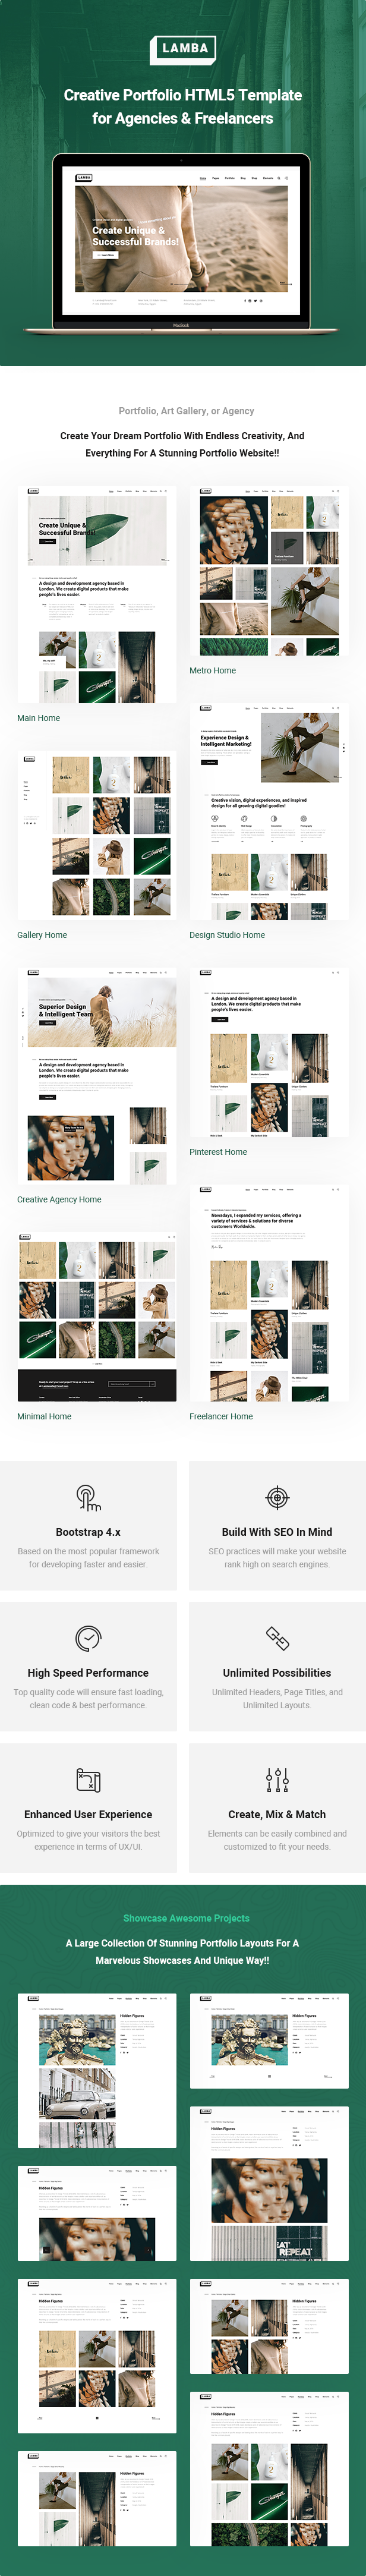 Lamba - Creative Portfolio & Agency HTML5 Template - 5